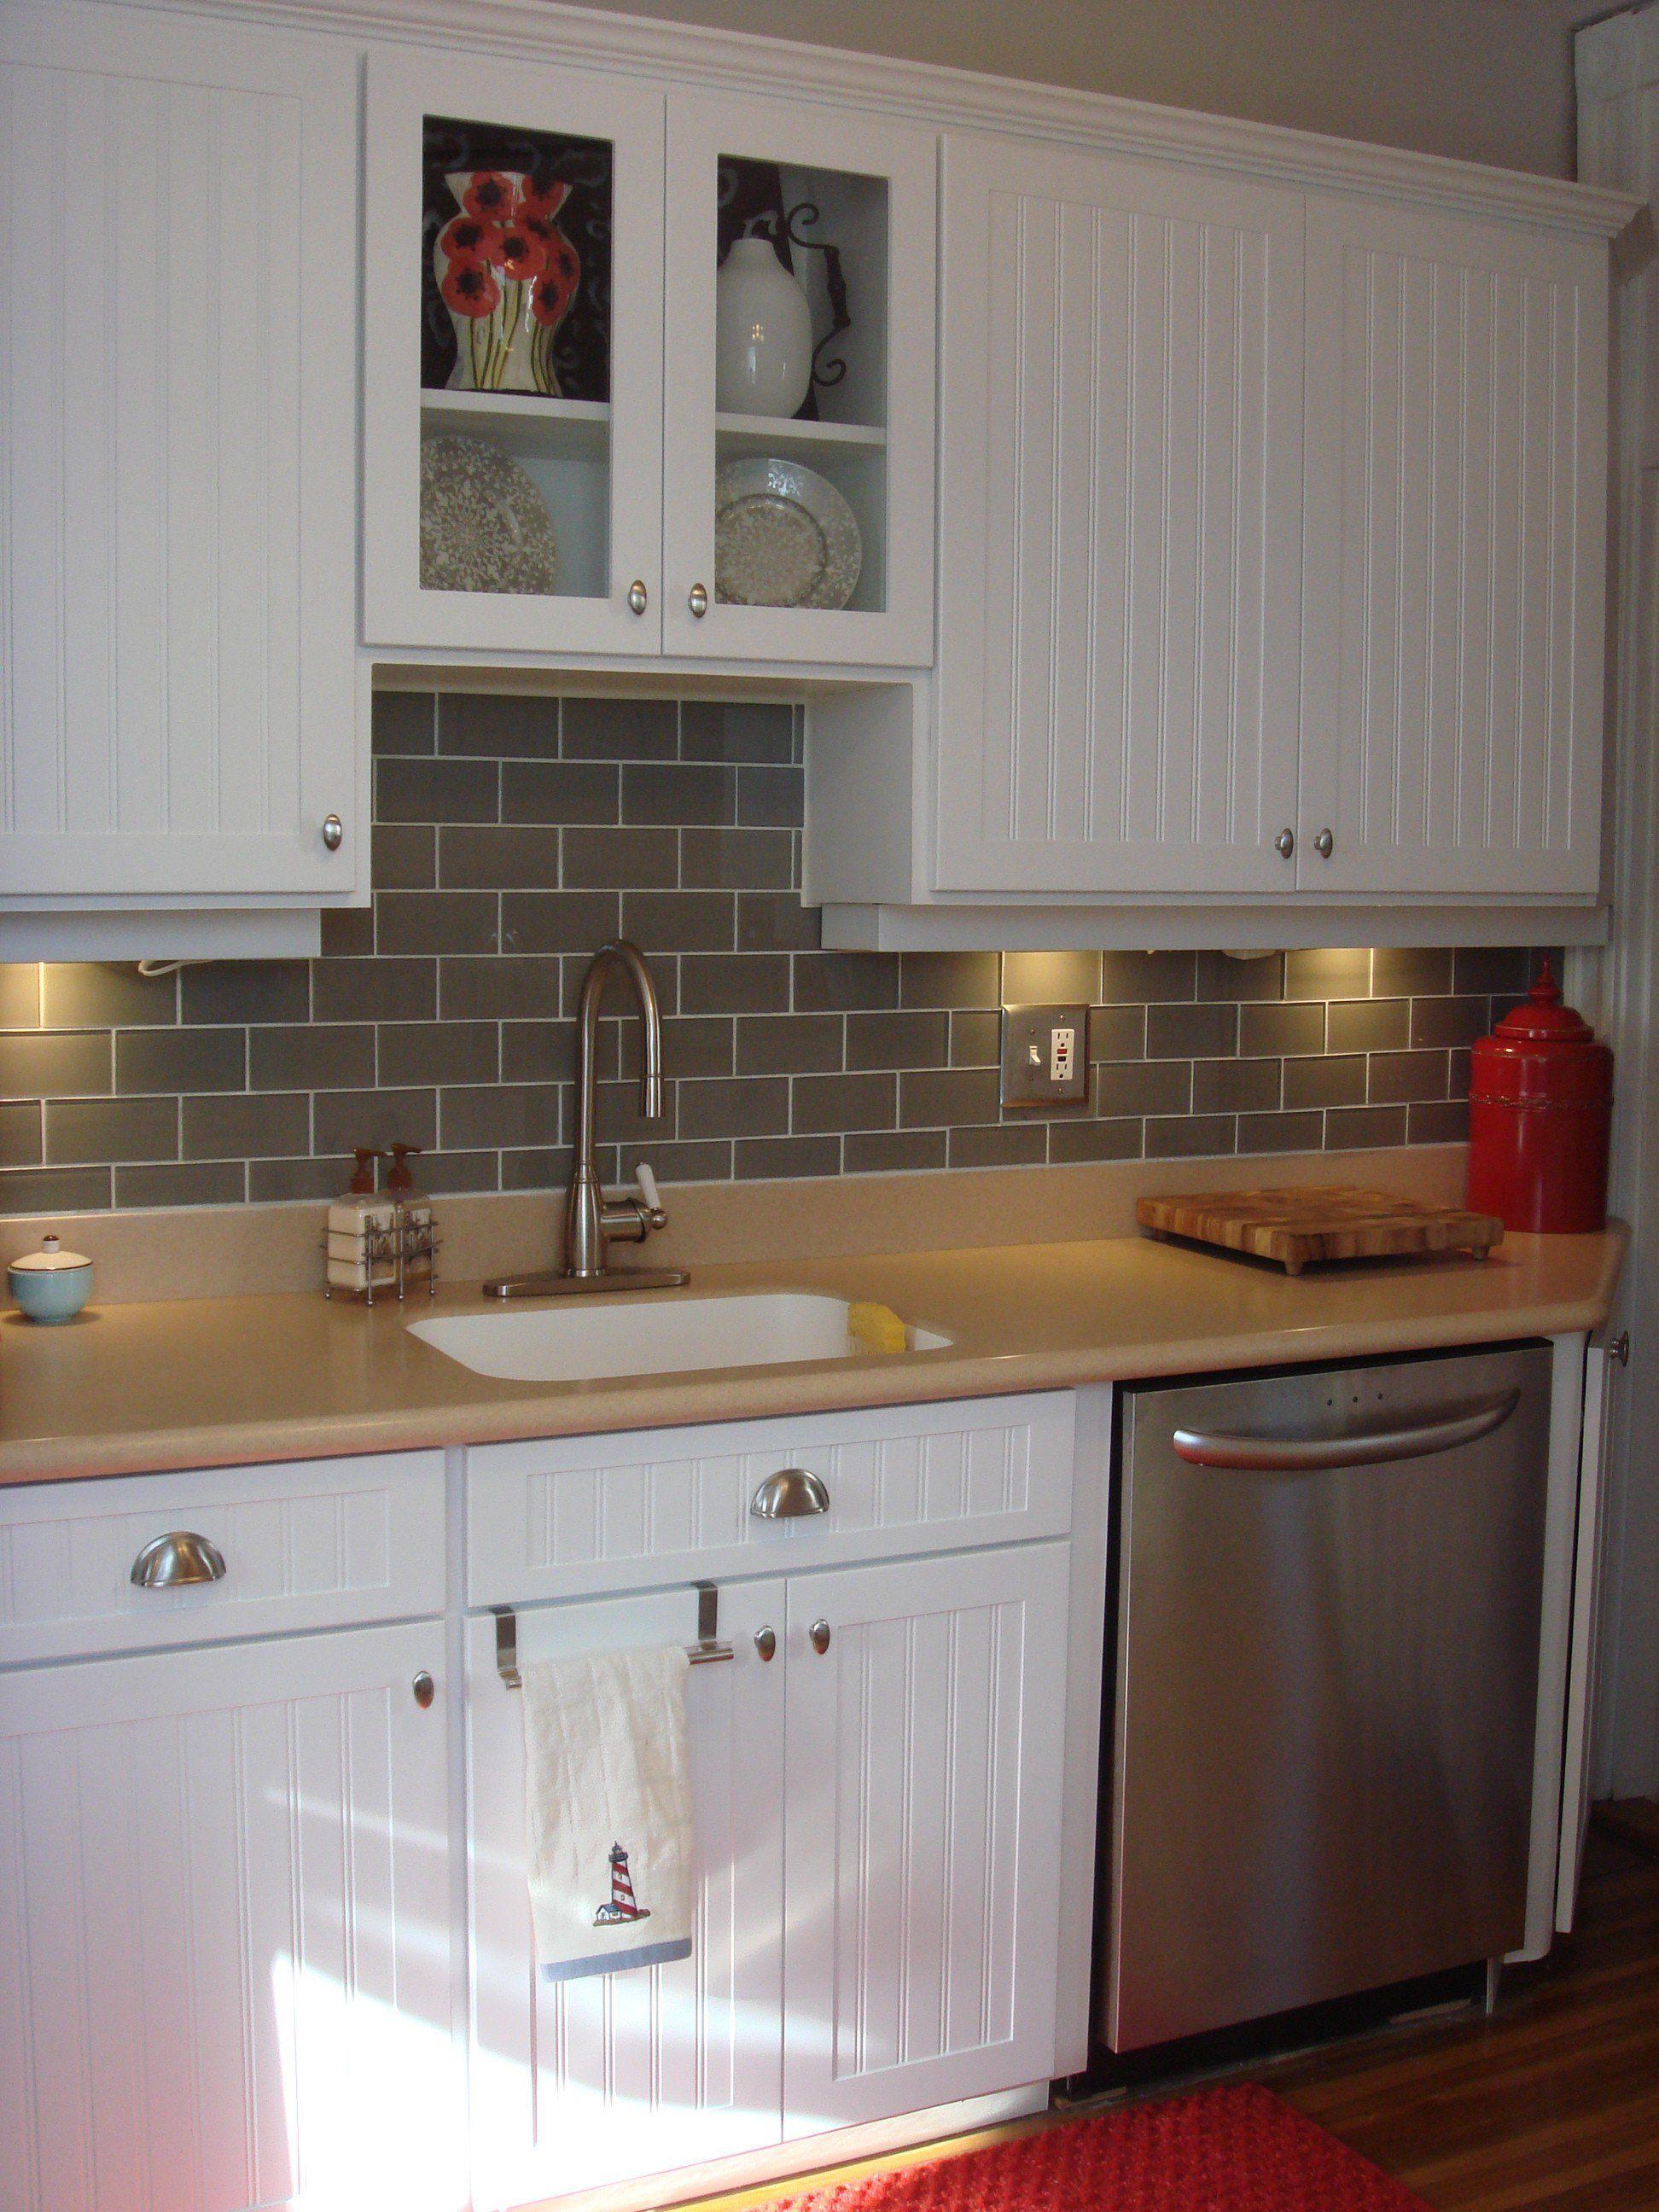 Lush Taupe 3x6 Pale Gray Beige Gl Subway Tile Kitchen Backsplash Installation